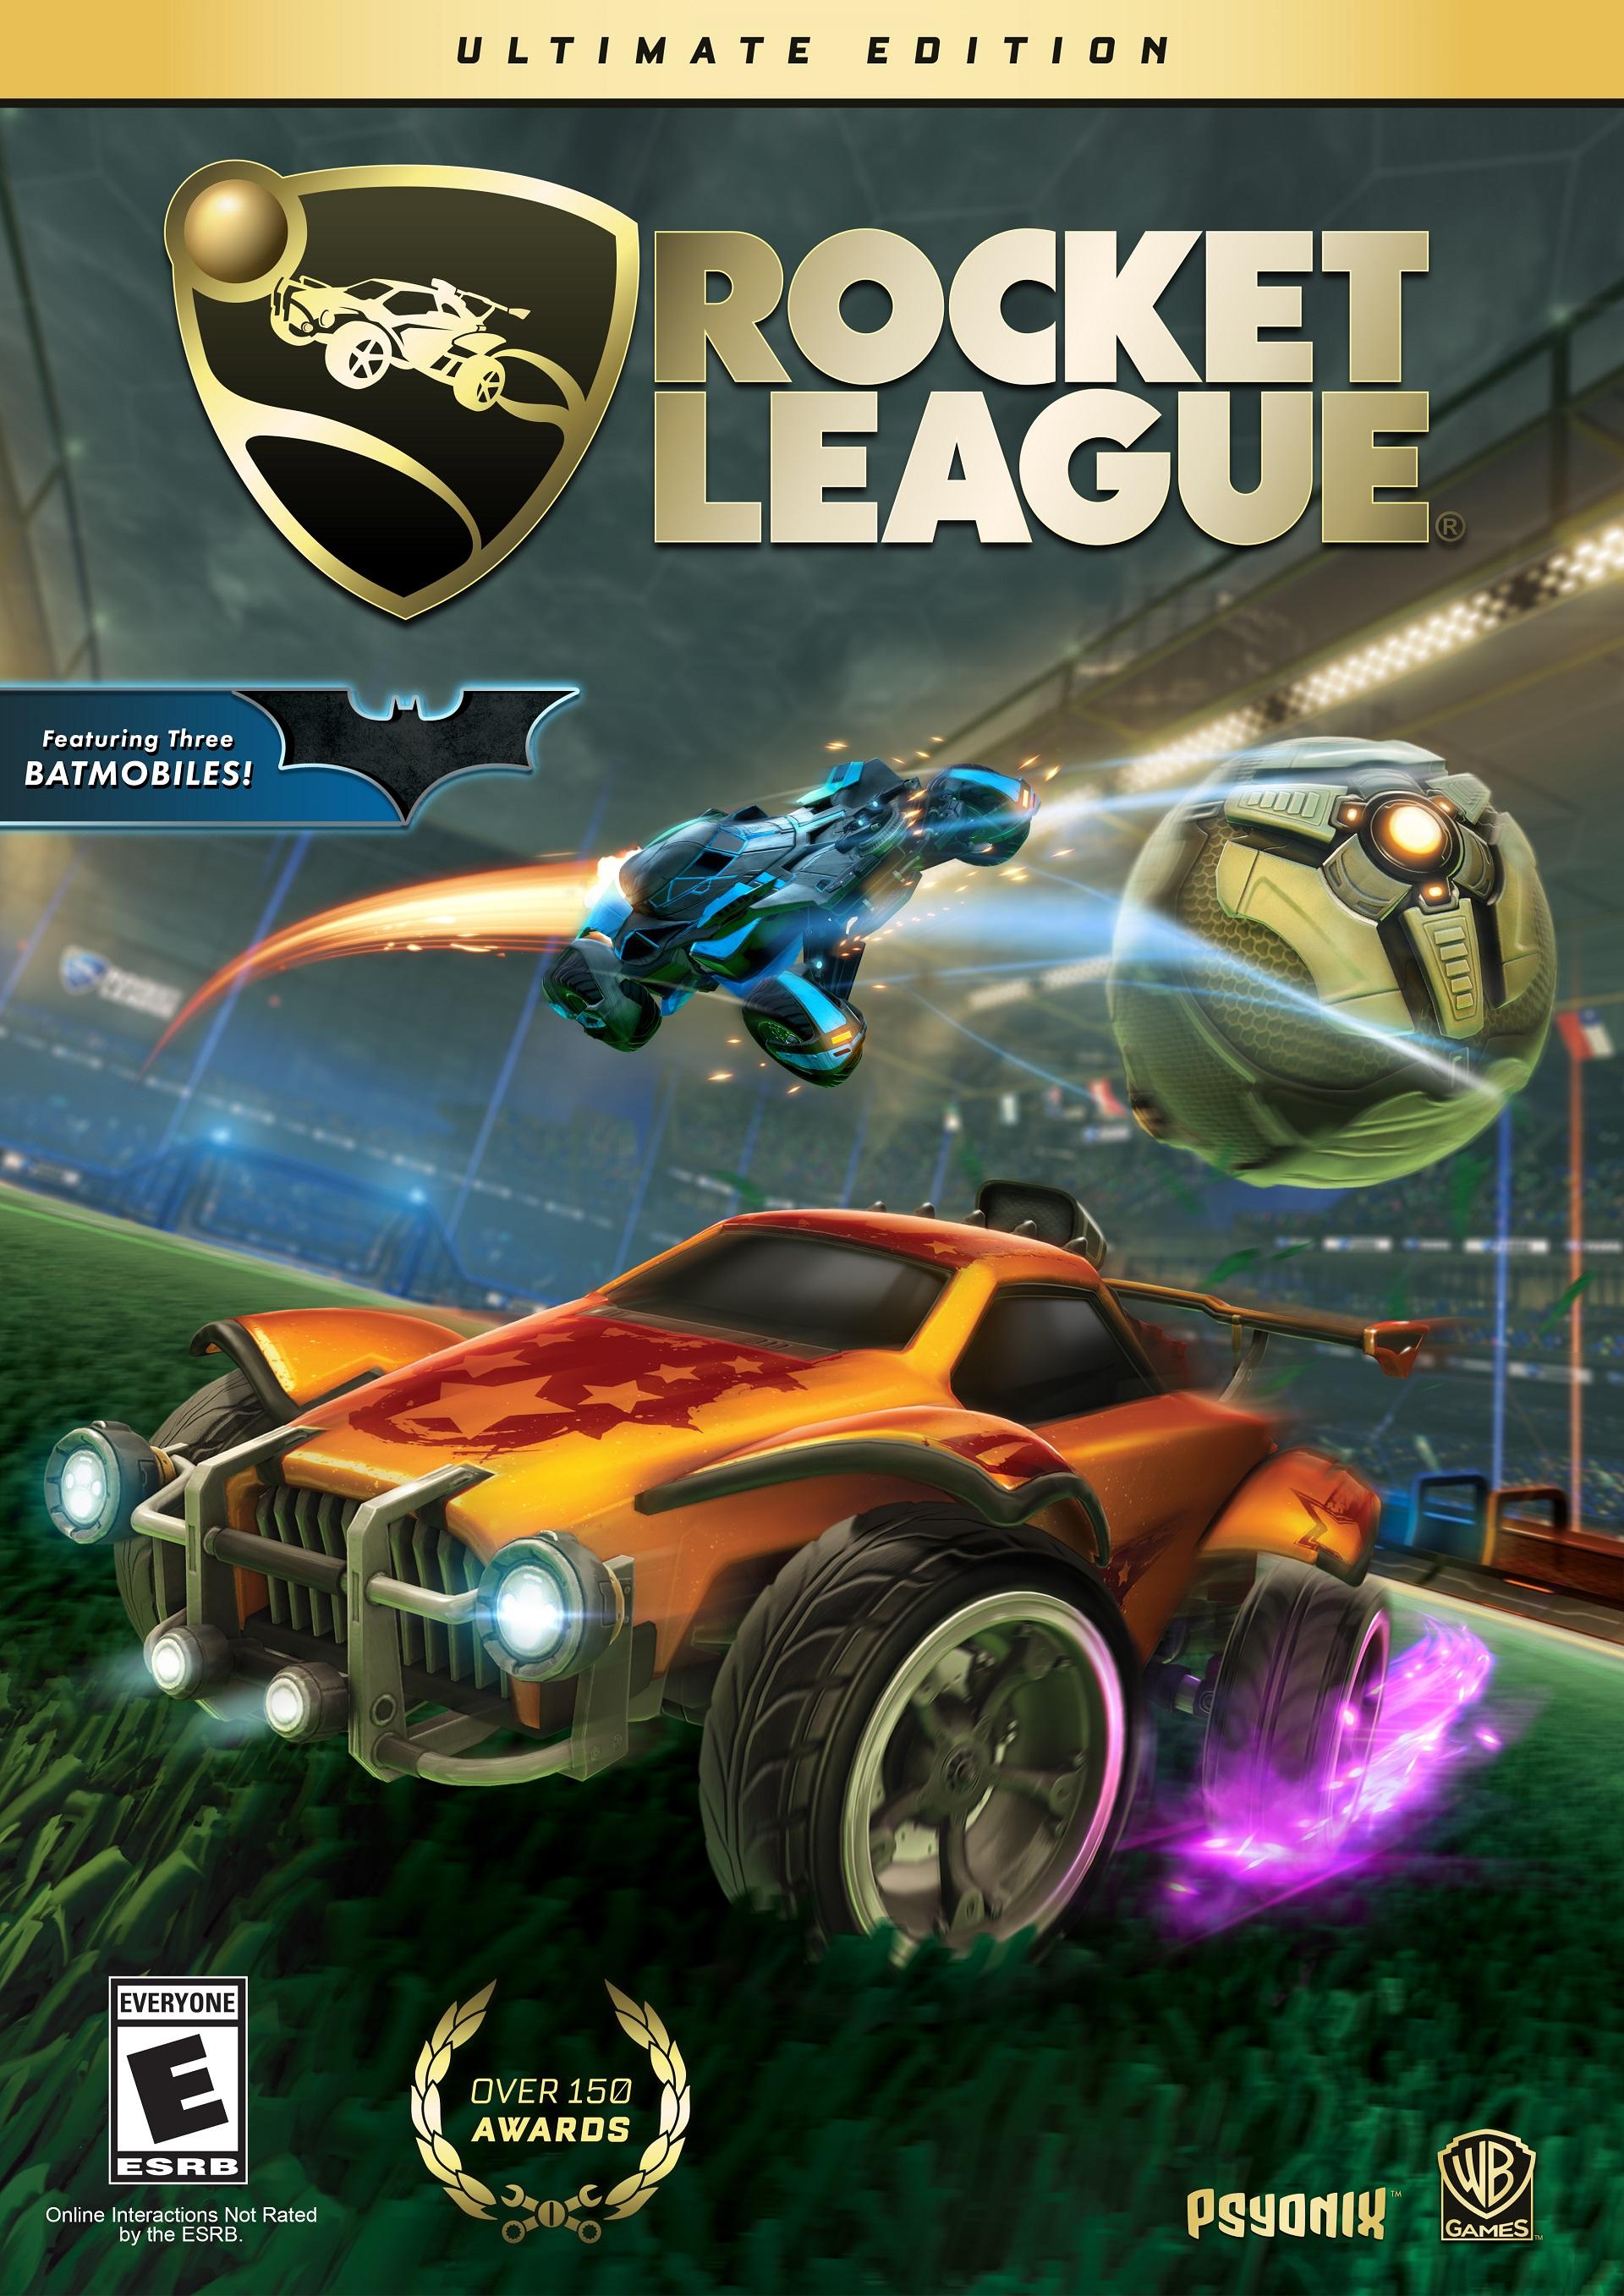 Rocket Leauge Ultimate Edition